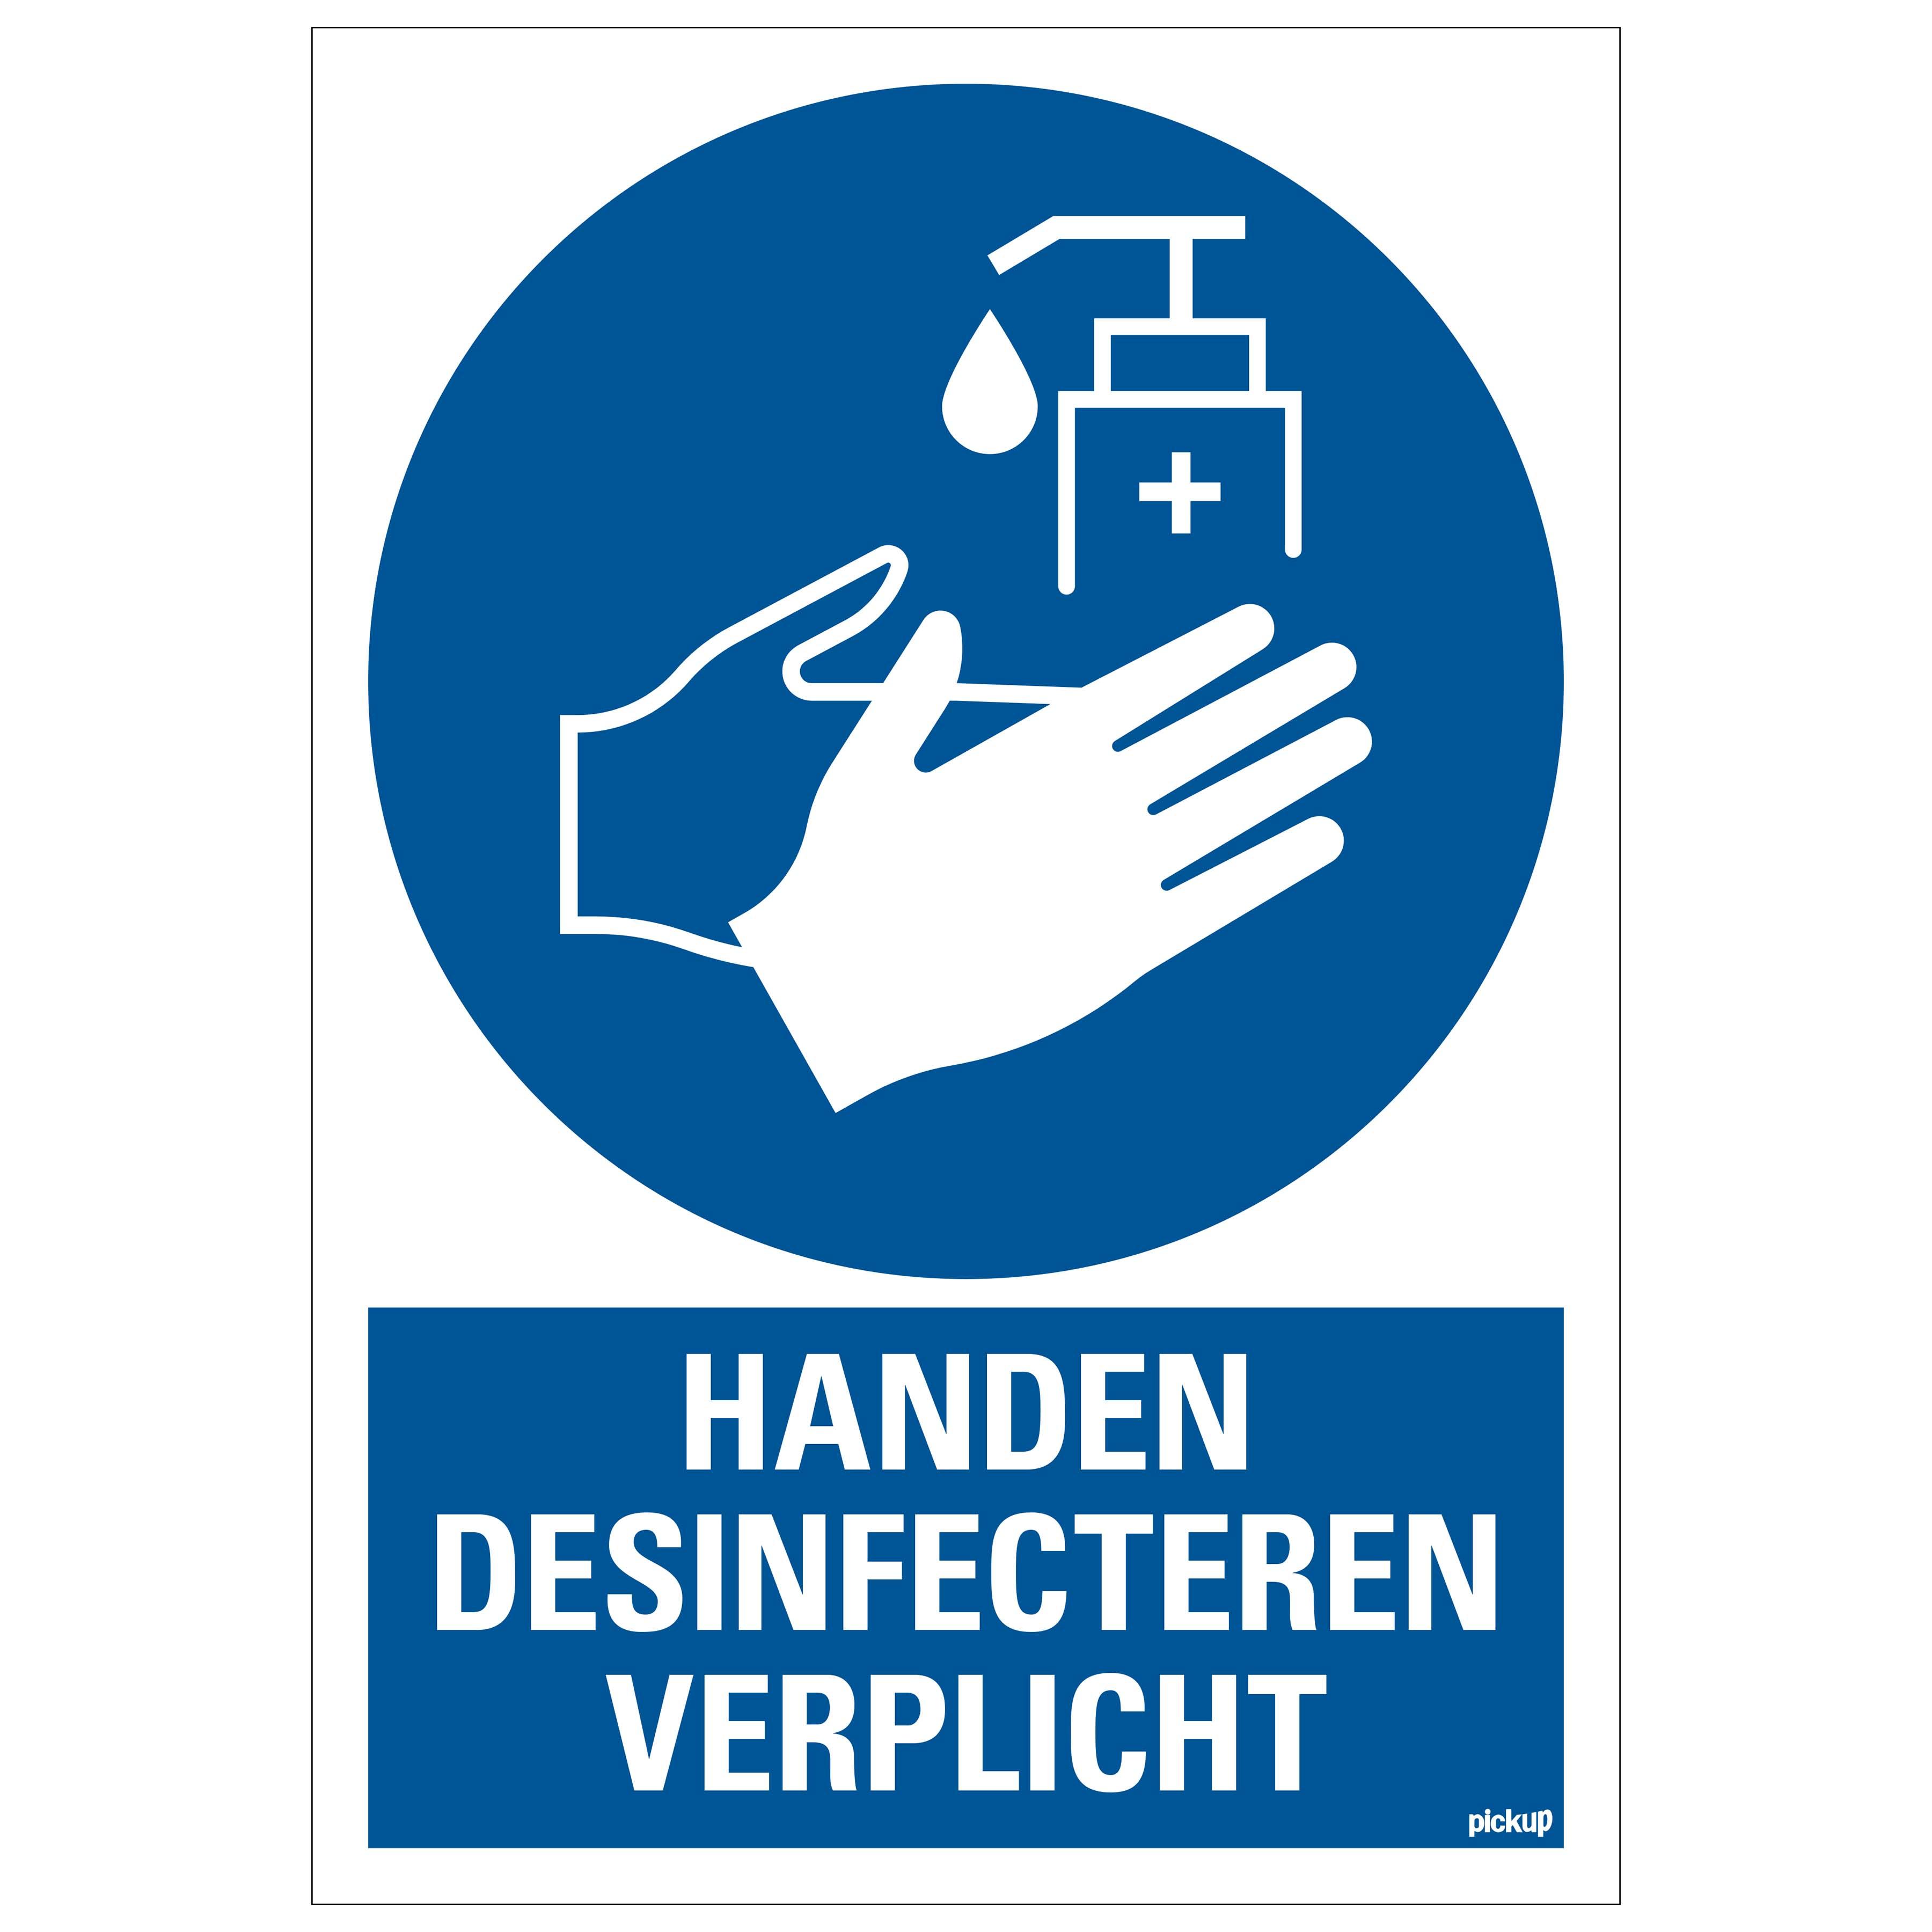 Bord Handen desinfecteren verplicht - Disinfect hands required - Désinfection des mains requise - Hände desinfizieren erforderlich - social distance COVID19 COVID-19 corona virus